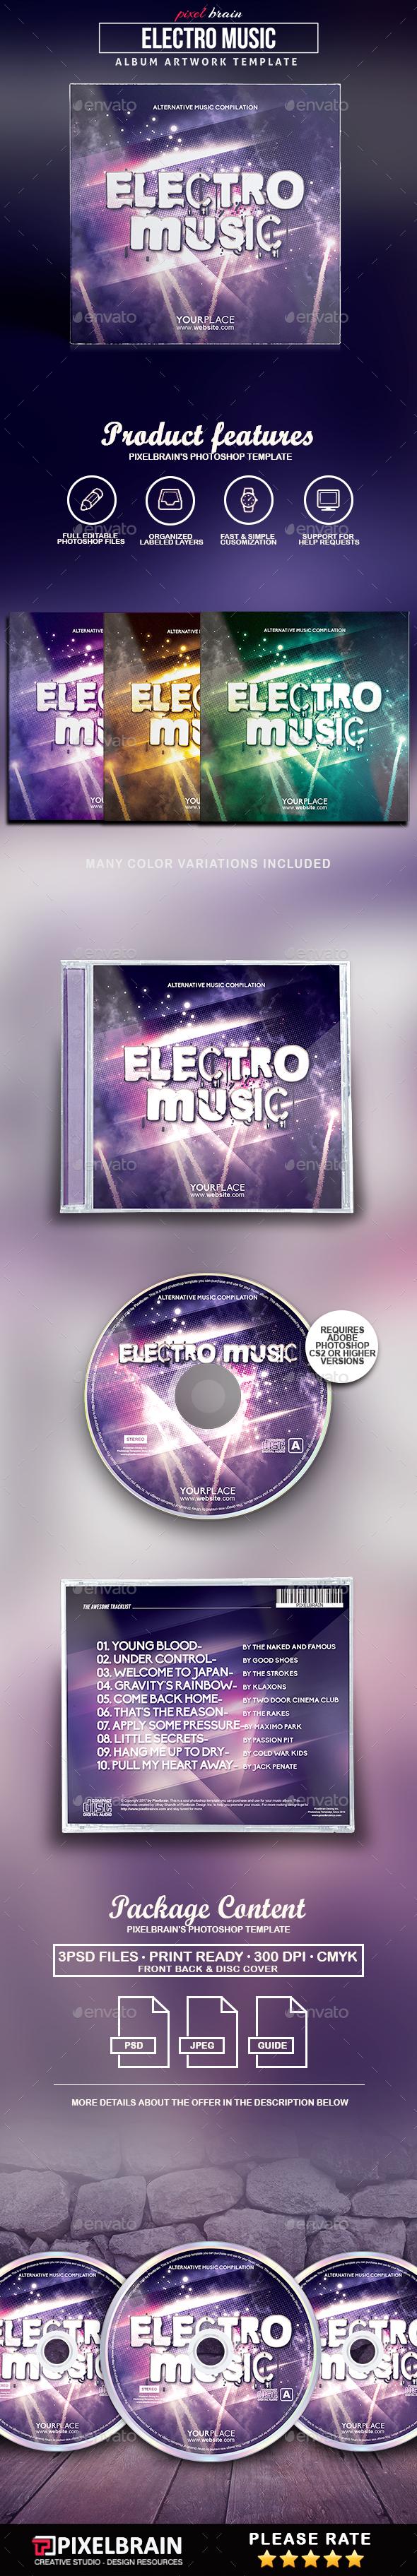 Electro Music CD Cover Artwork - CD & DVD Artwork Print Templates